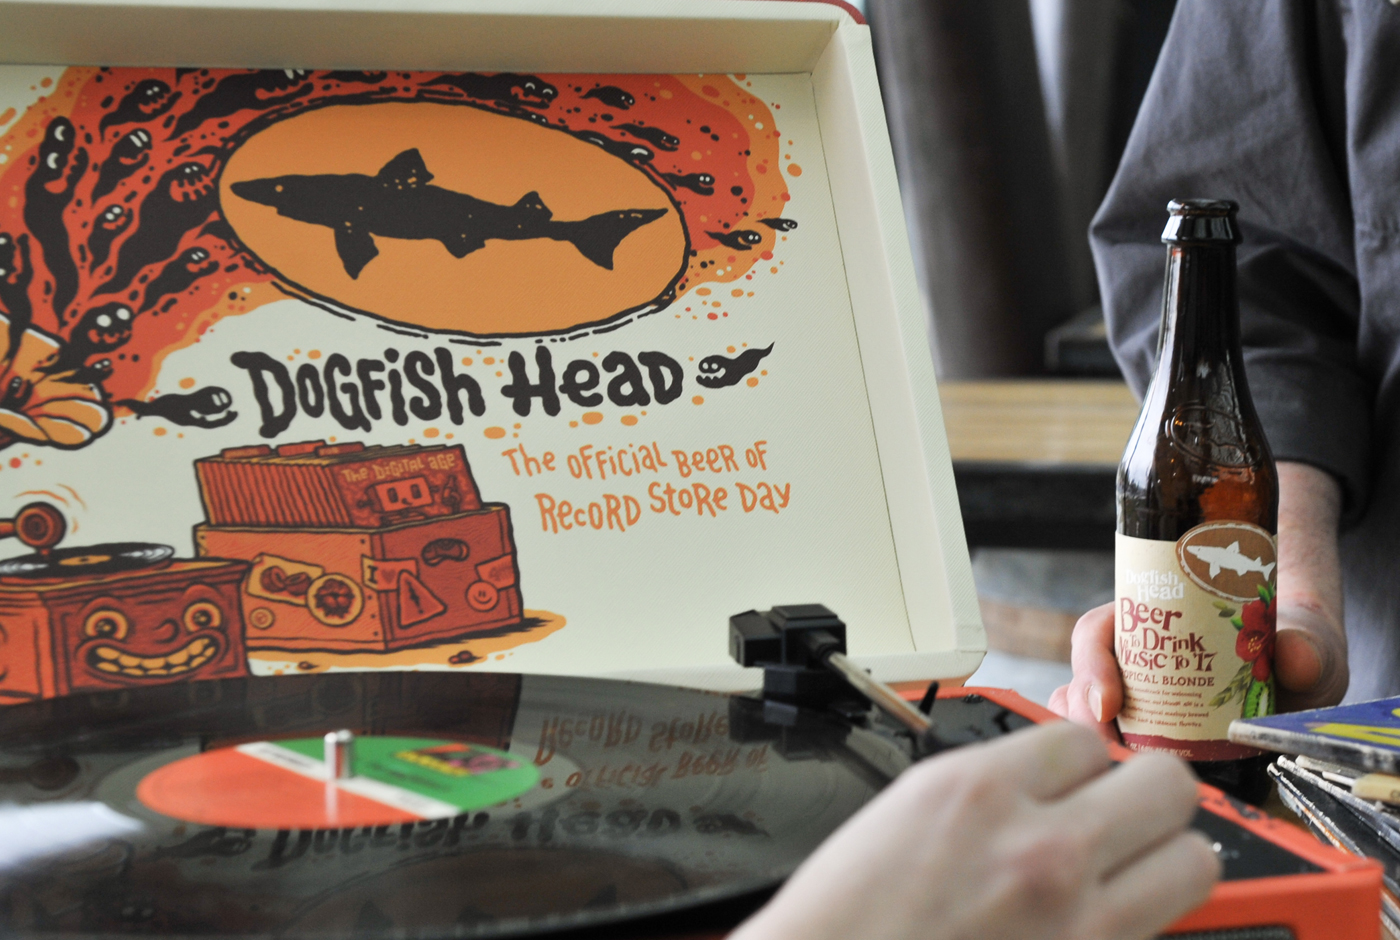 Dogfish-Head-Record-Store-Day-Tacoma